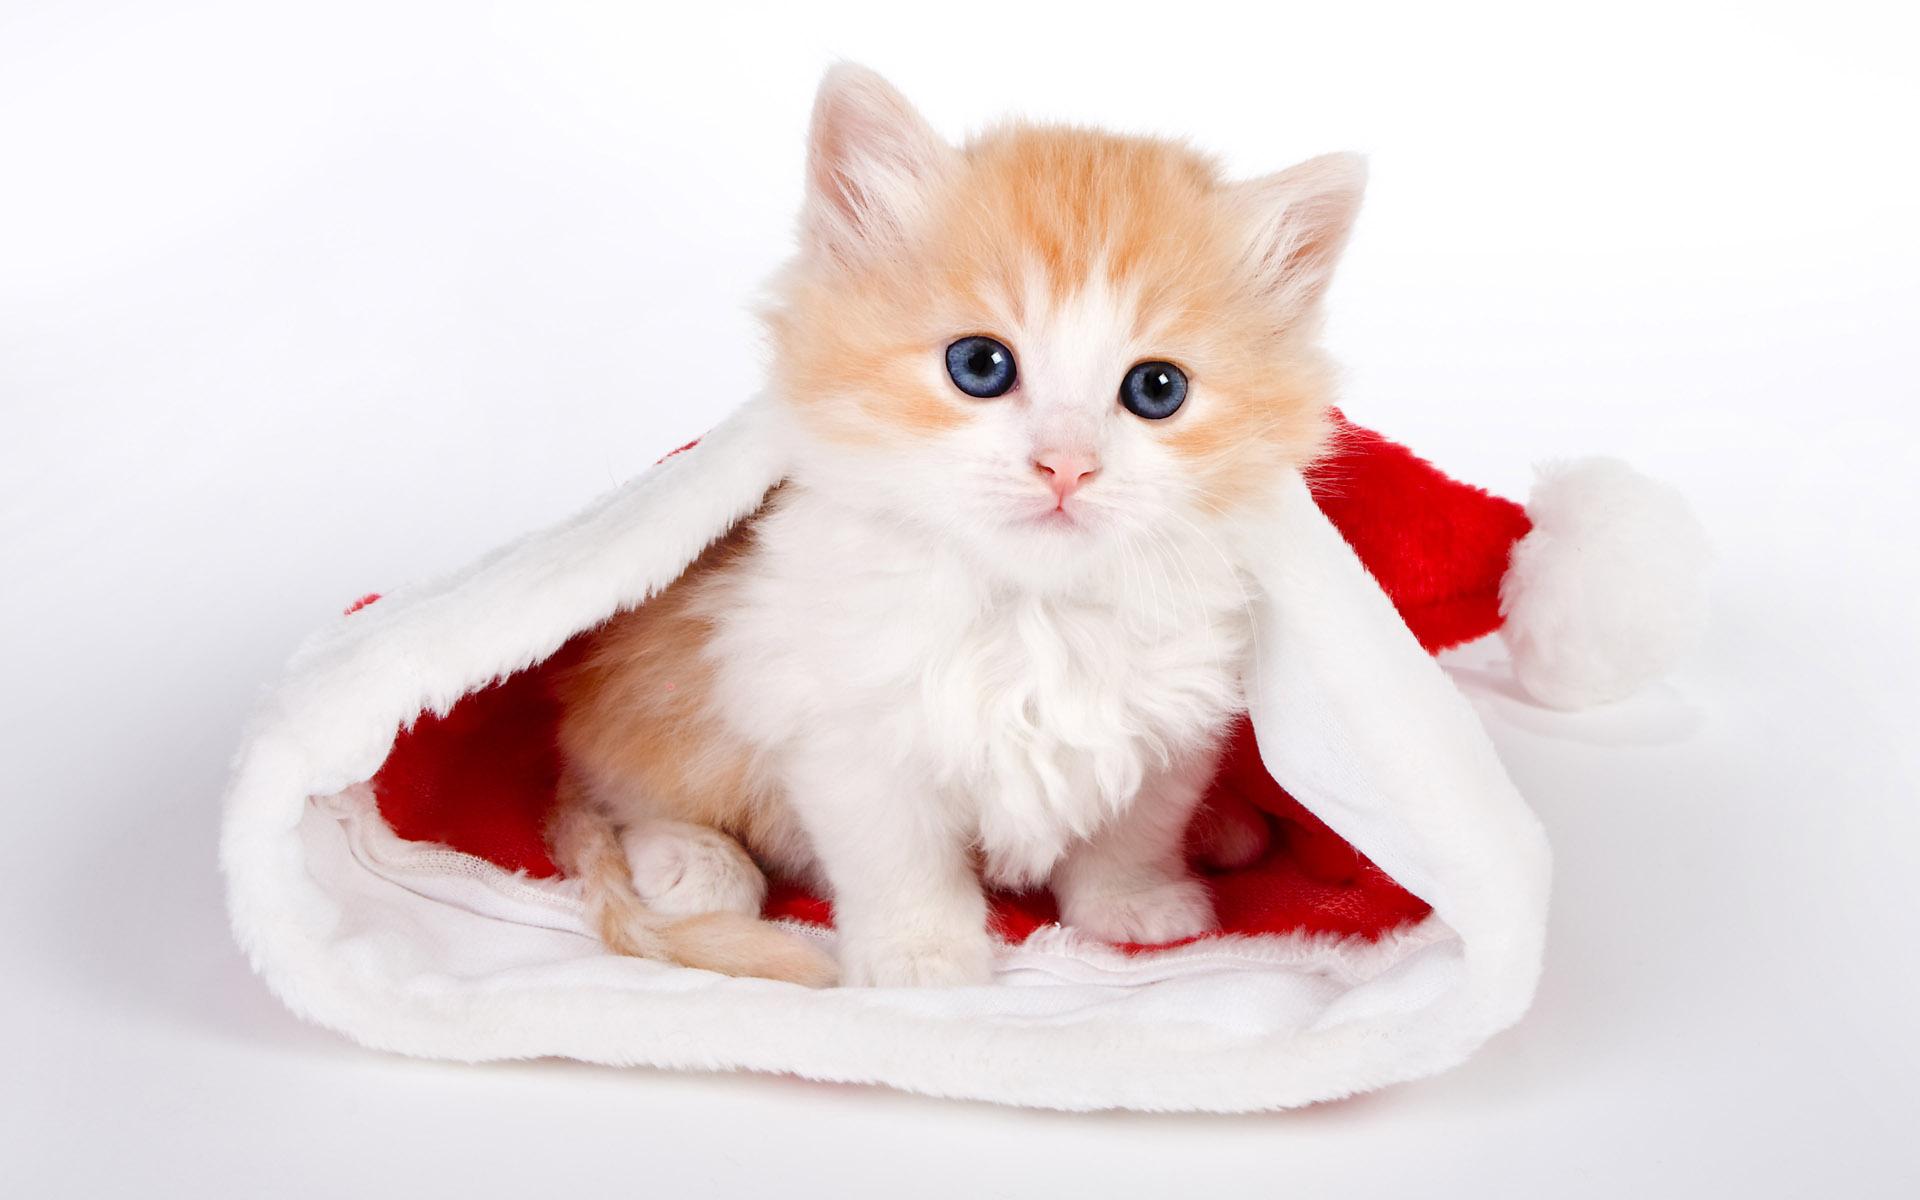 cute cat desktop wallpaper cat desktop wallpaper Desktop 1920x1200